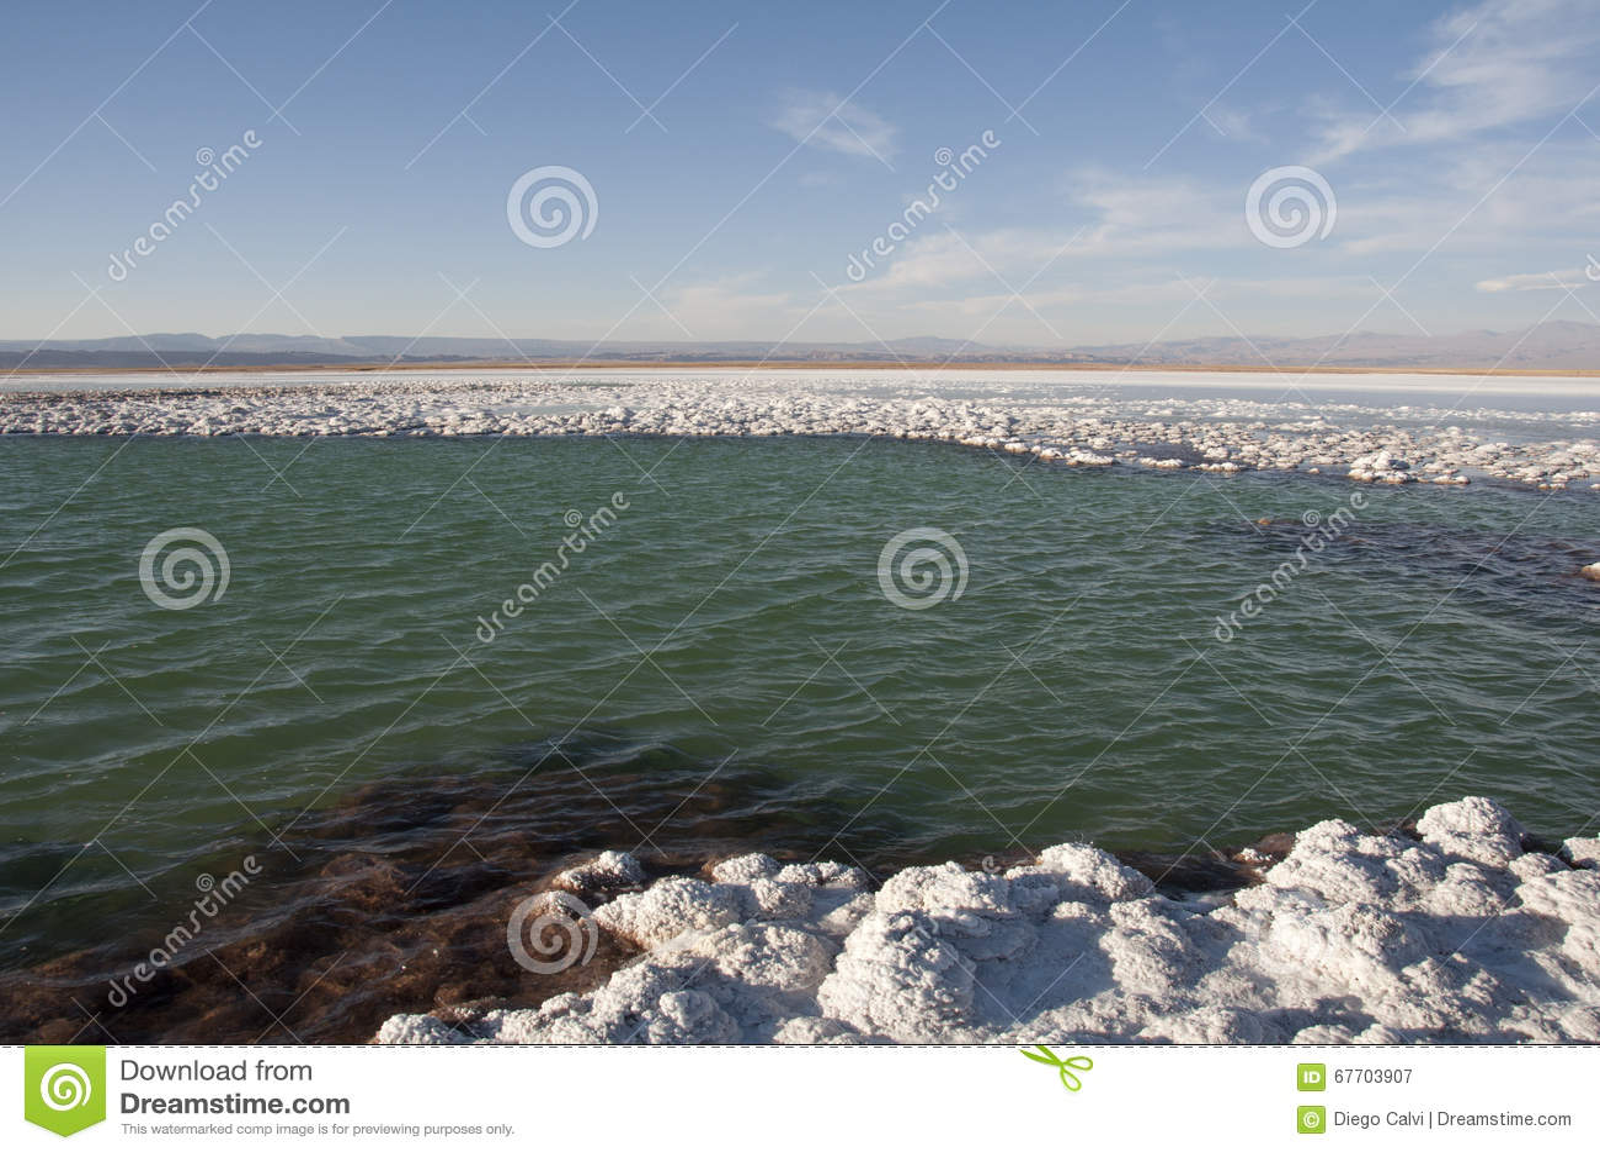 Lagoon saltwater, Chile